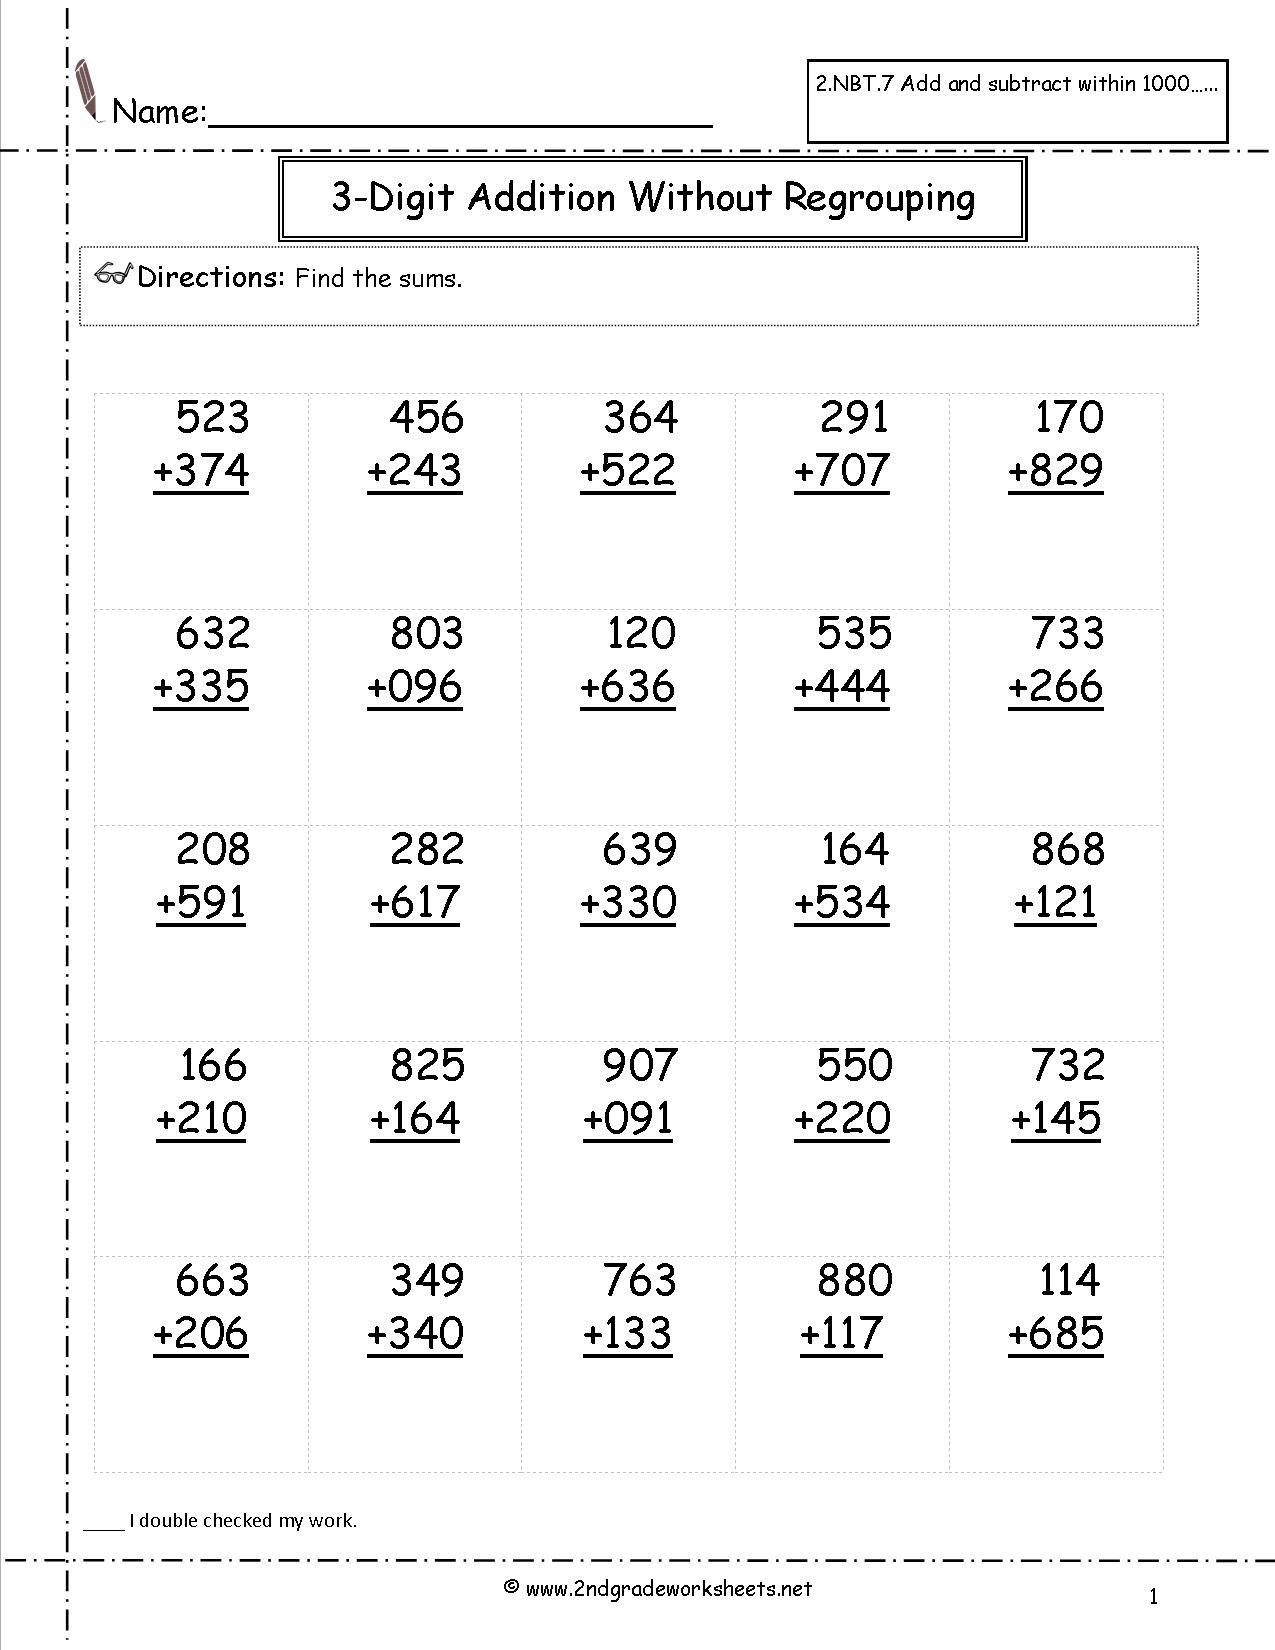 Free Math Worksheets And Printouts | Arithmetic Worksheets Printable